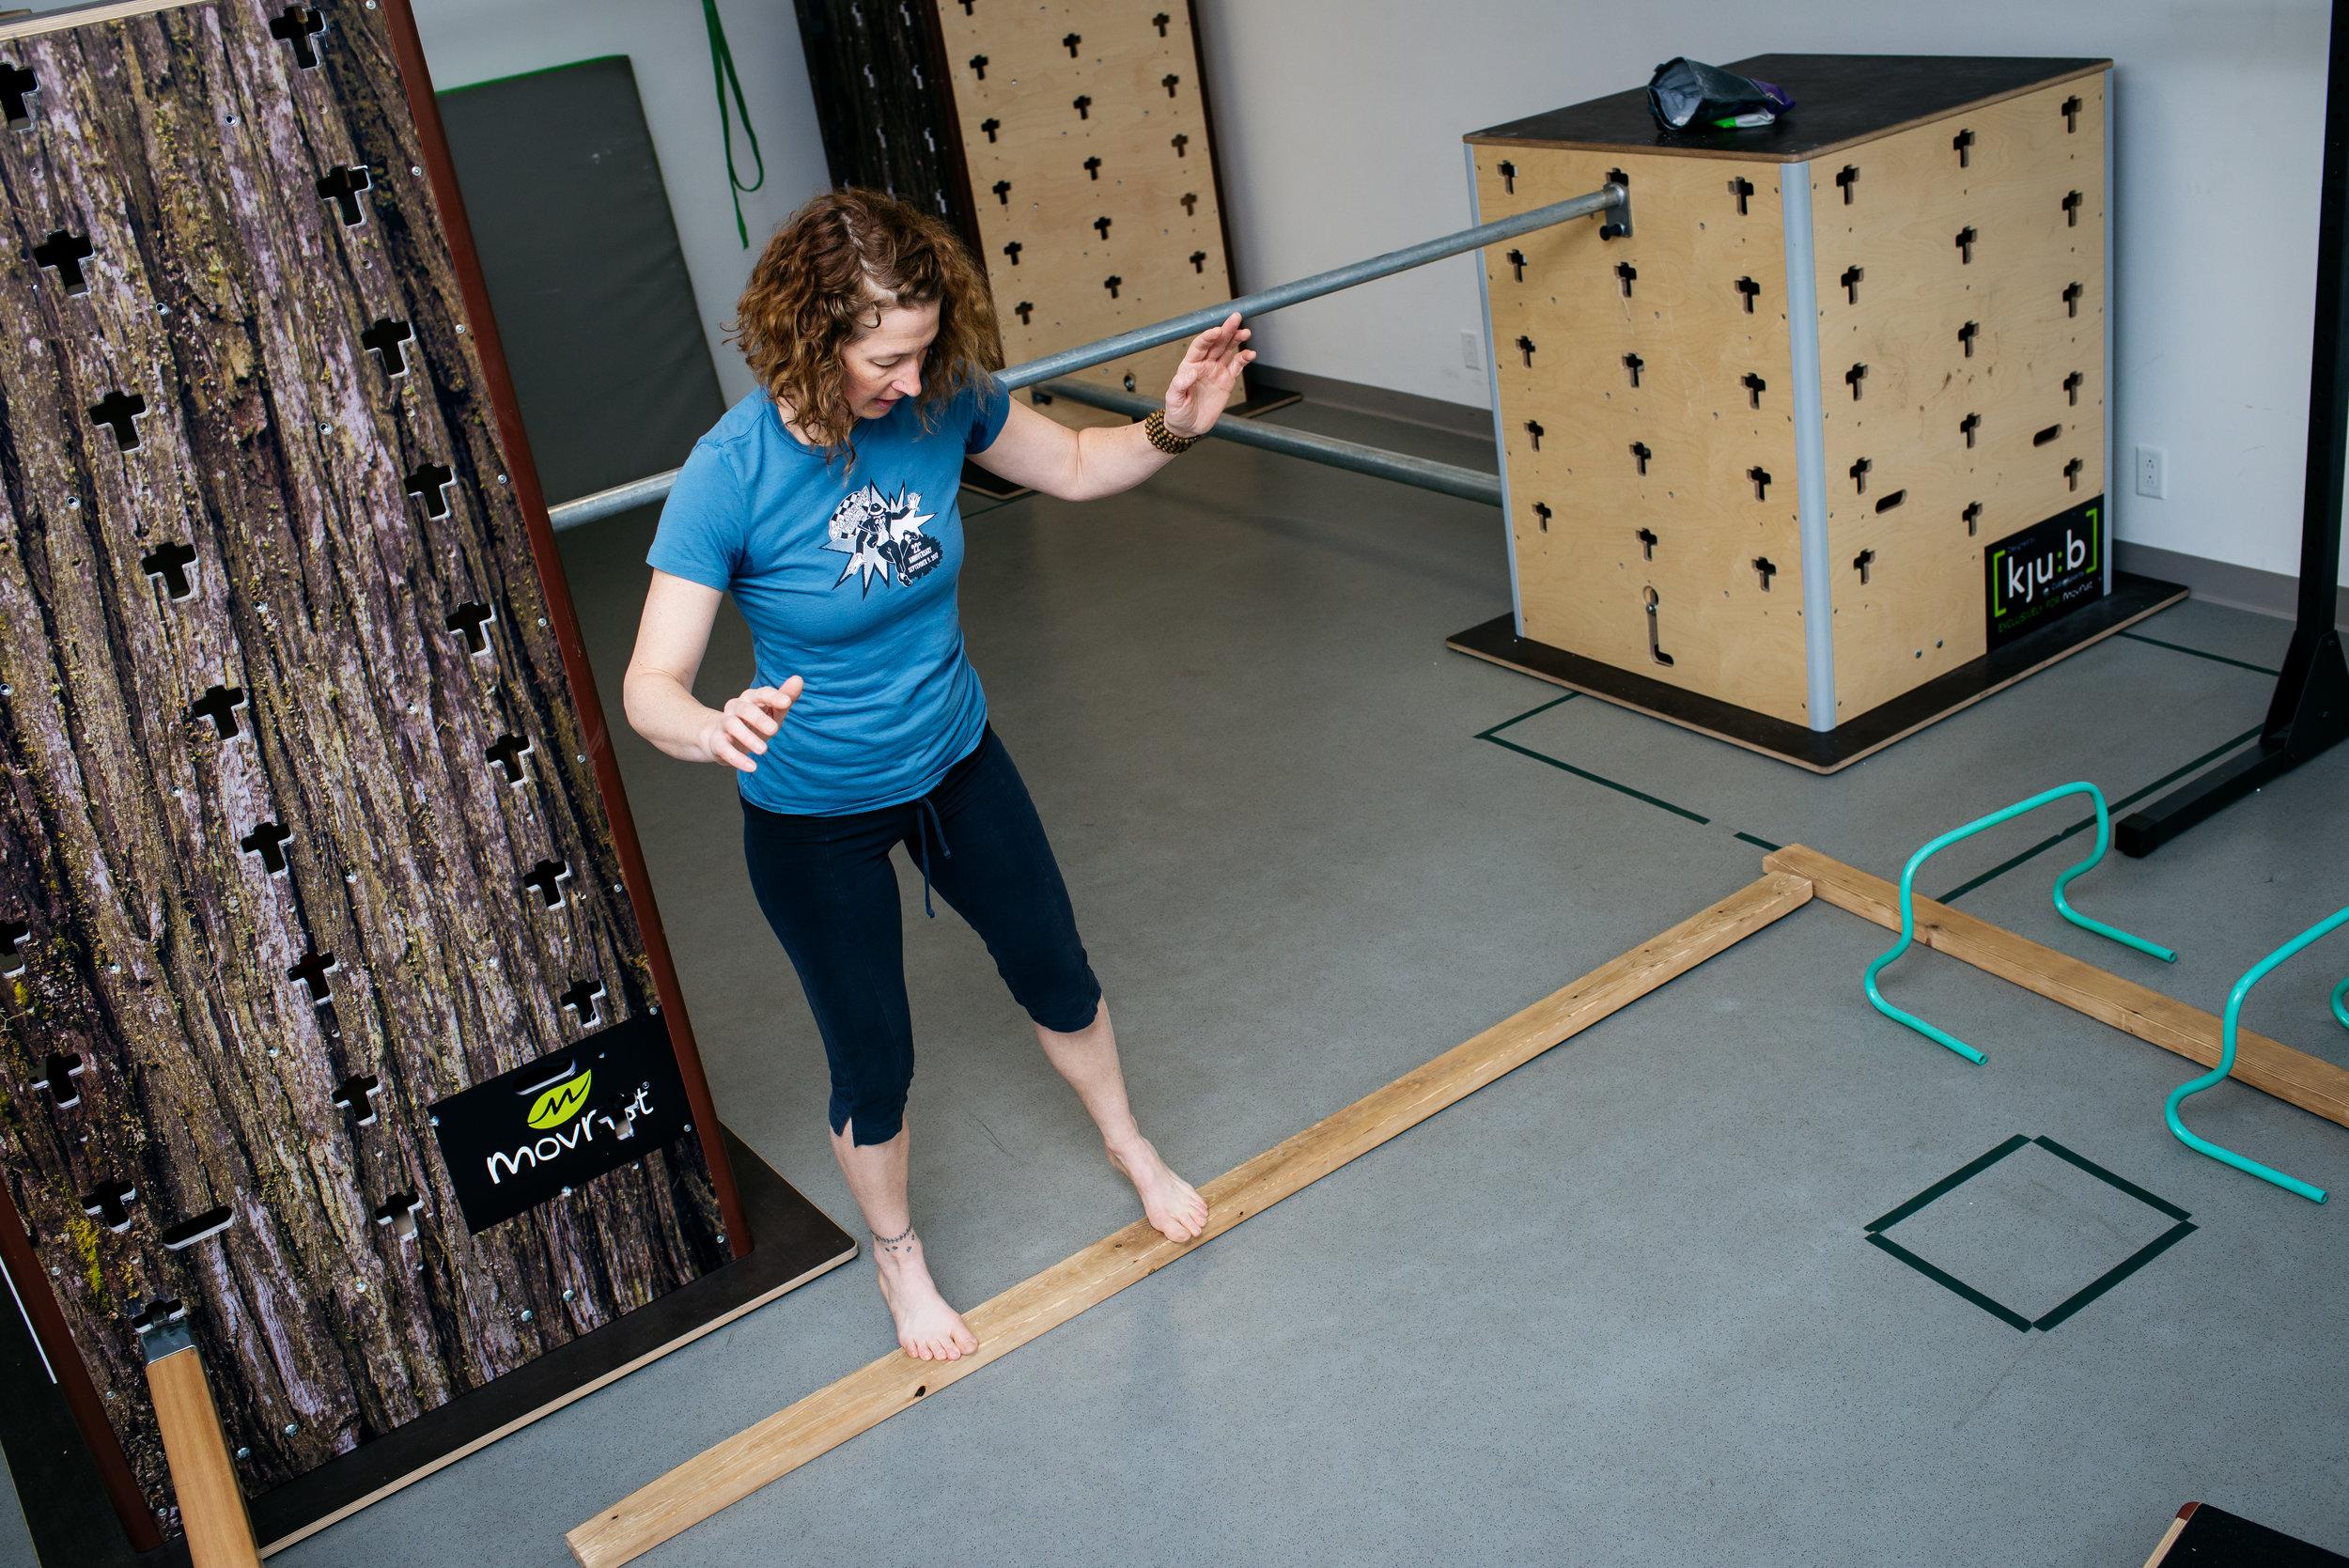 Bonnie MovNat lateral balance MoveTru Albuquerque